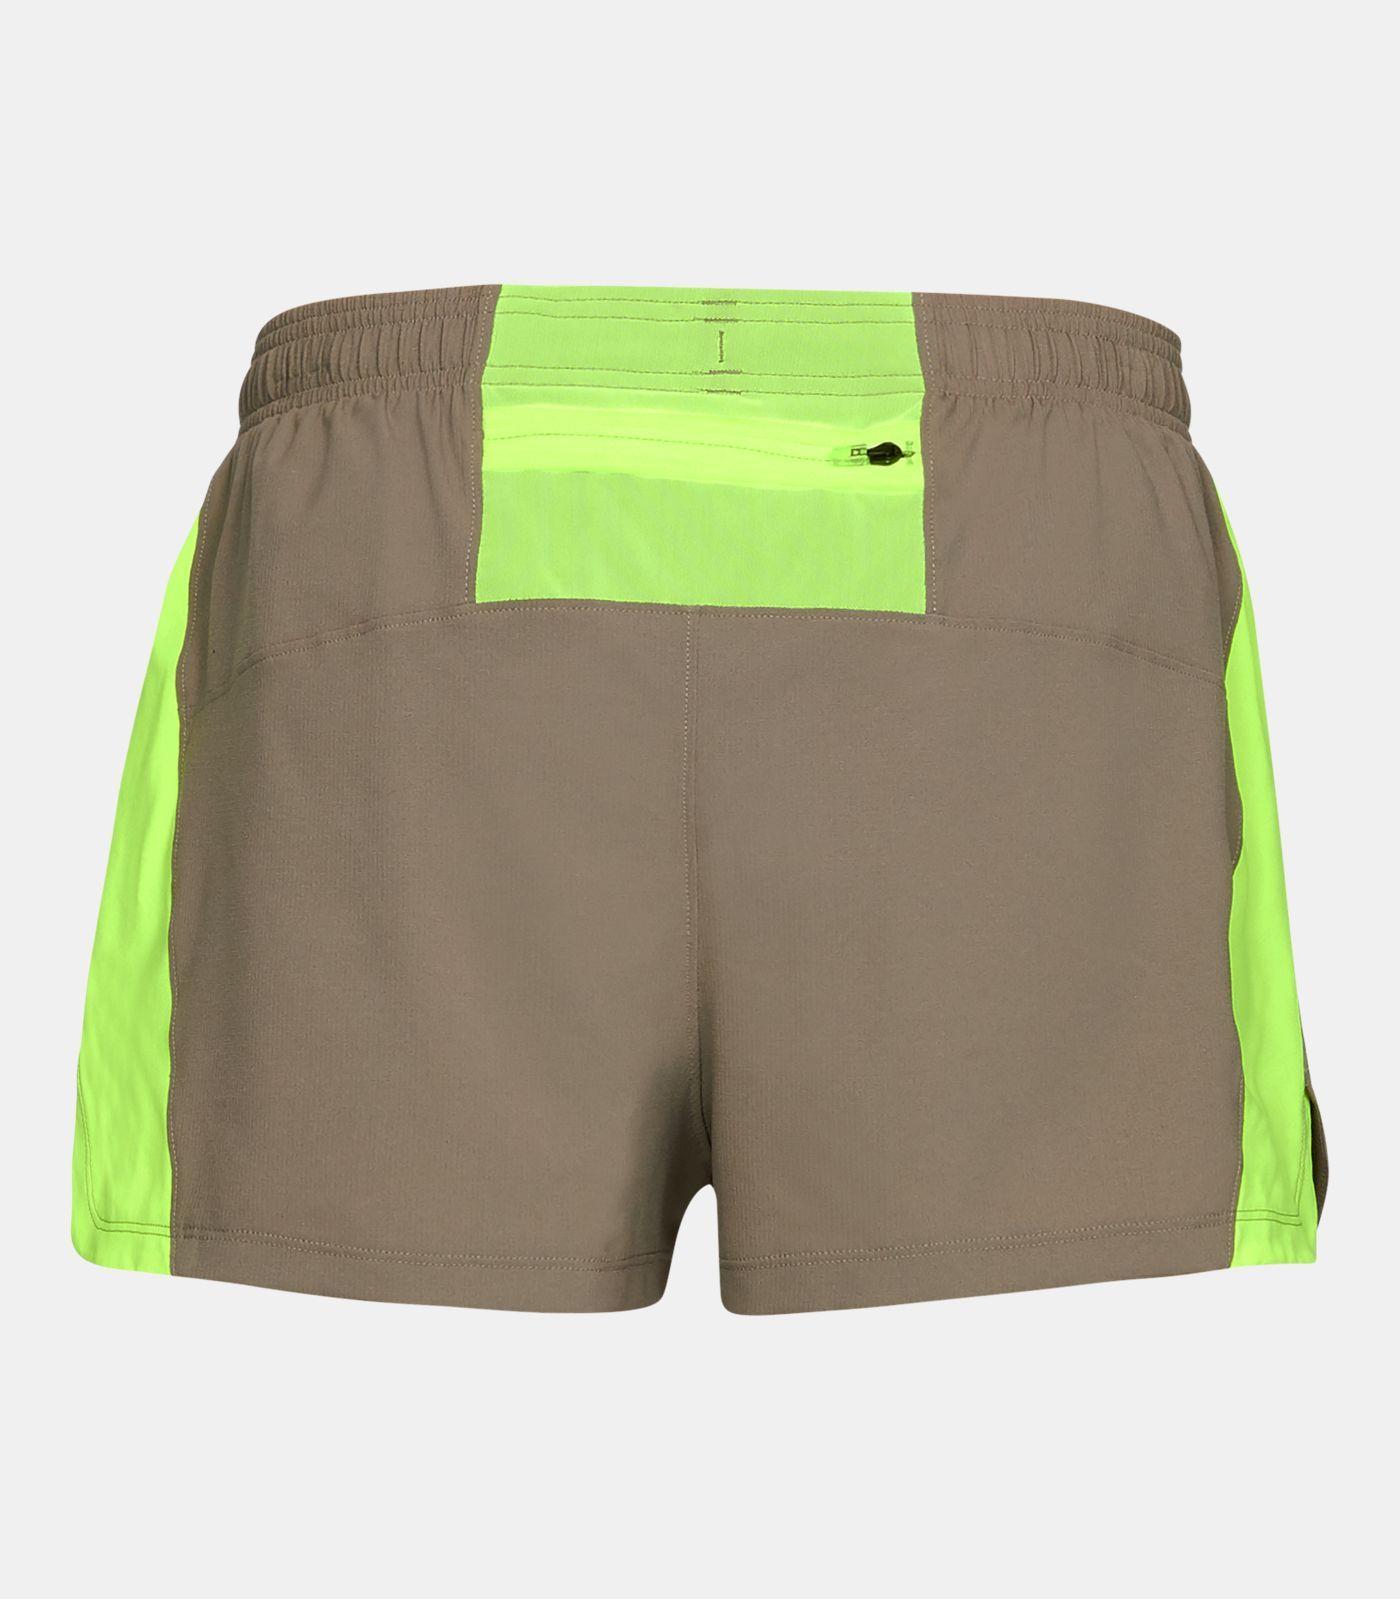 57edd2d268 Under Armour Men's UA Launch SW Split Shorts in 2019   Under Armor ...